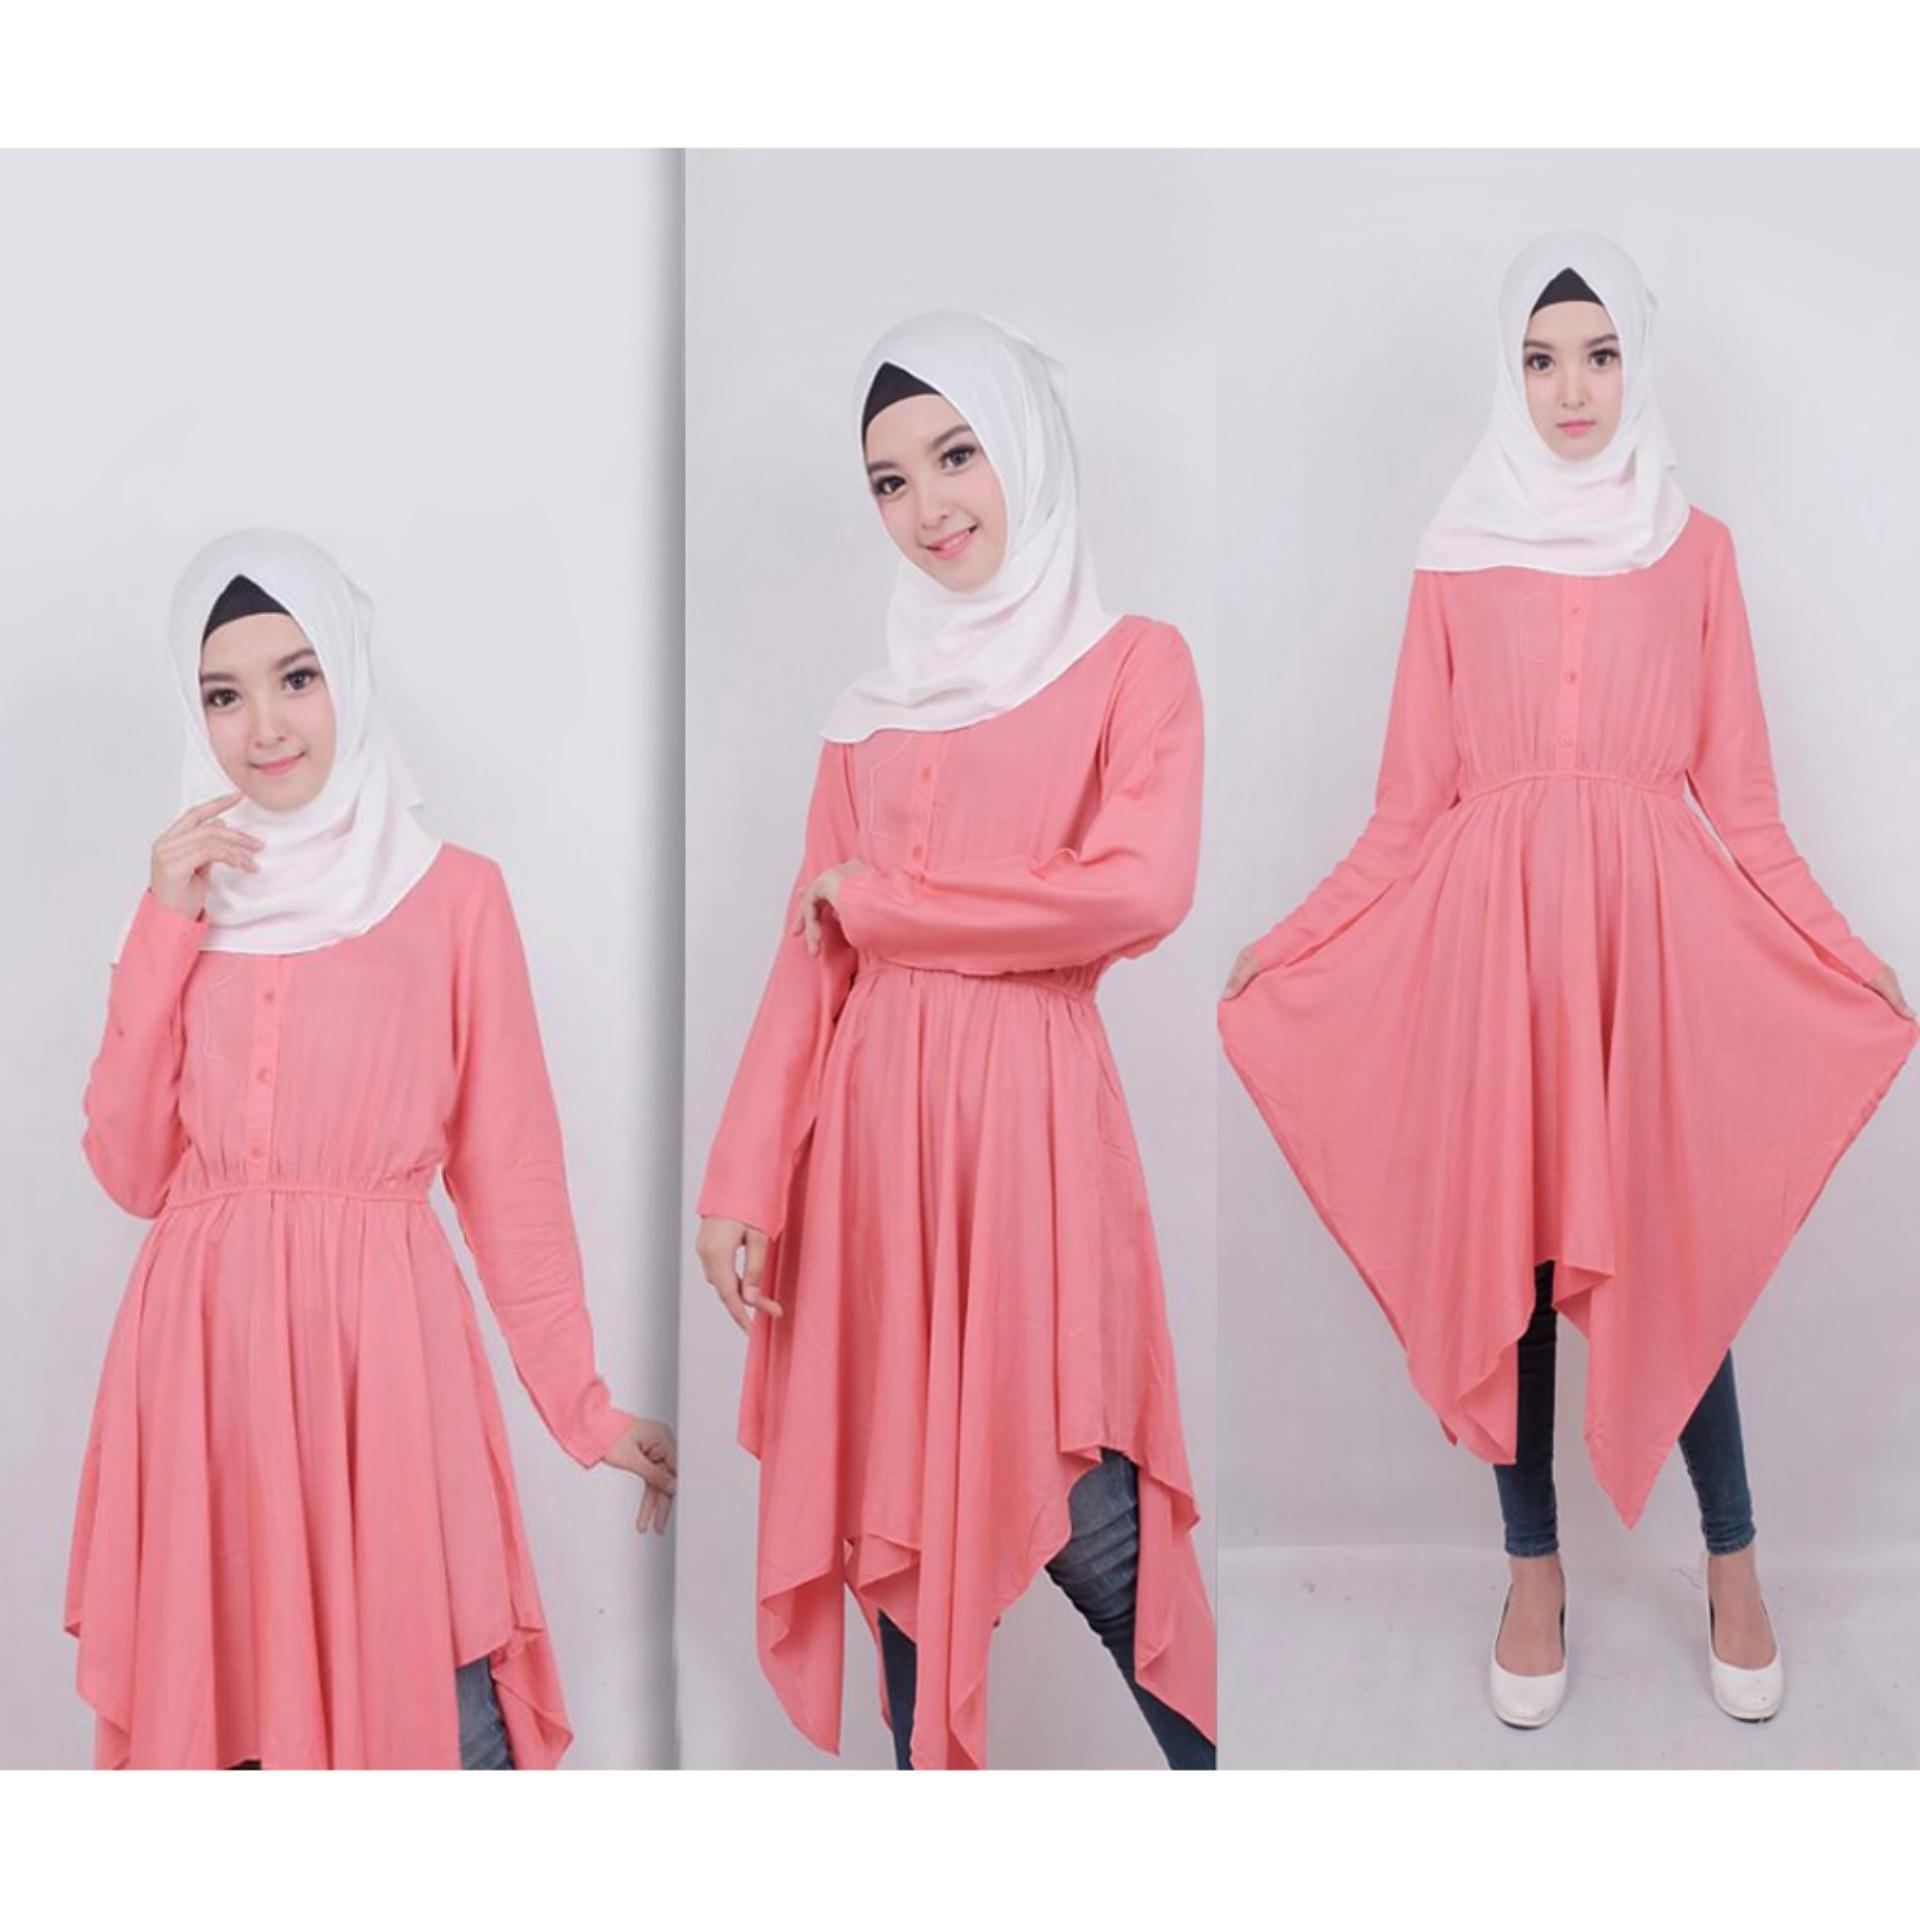 Jual Ayu Fashion Dress Sauqina Pashmina Salem 1 Best Seller Online Indonesia